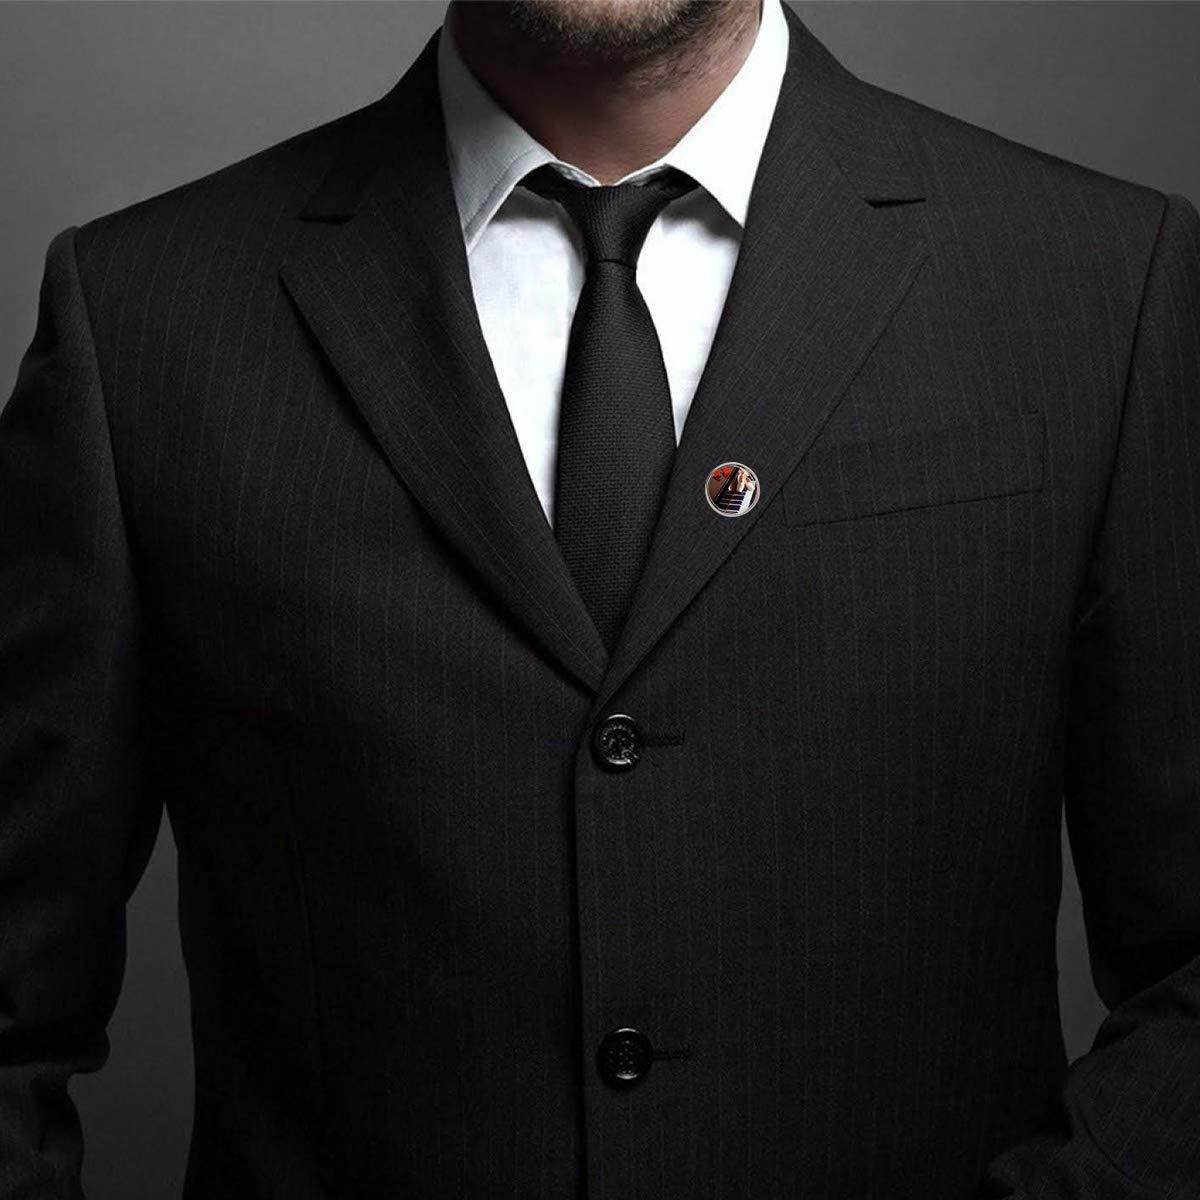 Custom Lapel Pin Brooches Ballet Slippers Banquet Badge Pins Trendy Accessory Jacket T-Shirt Bag Hat Shoe